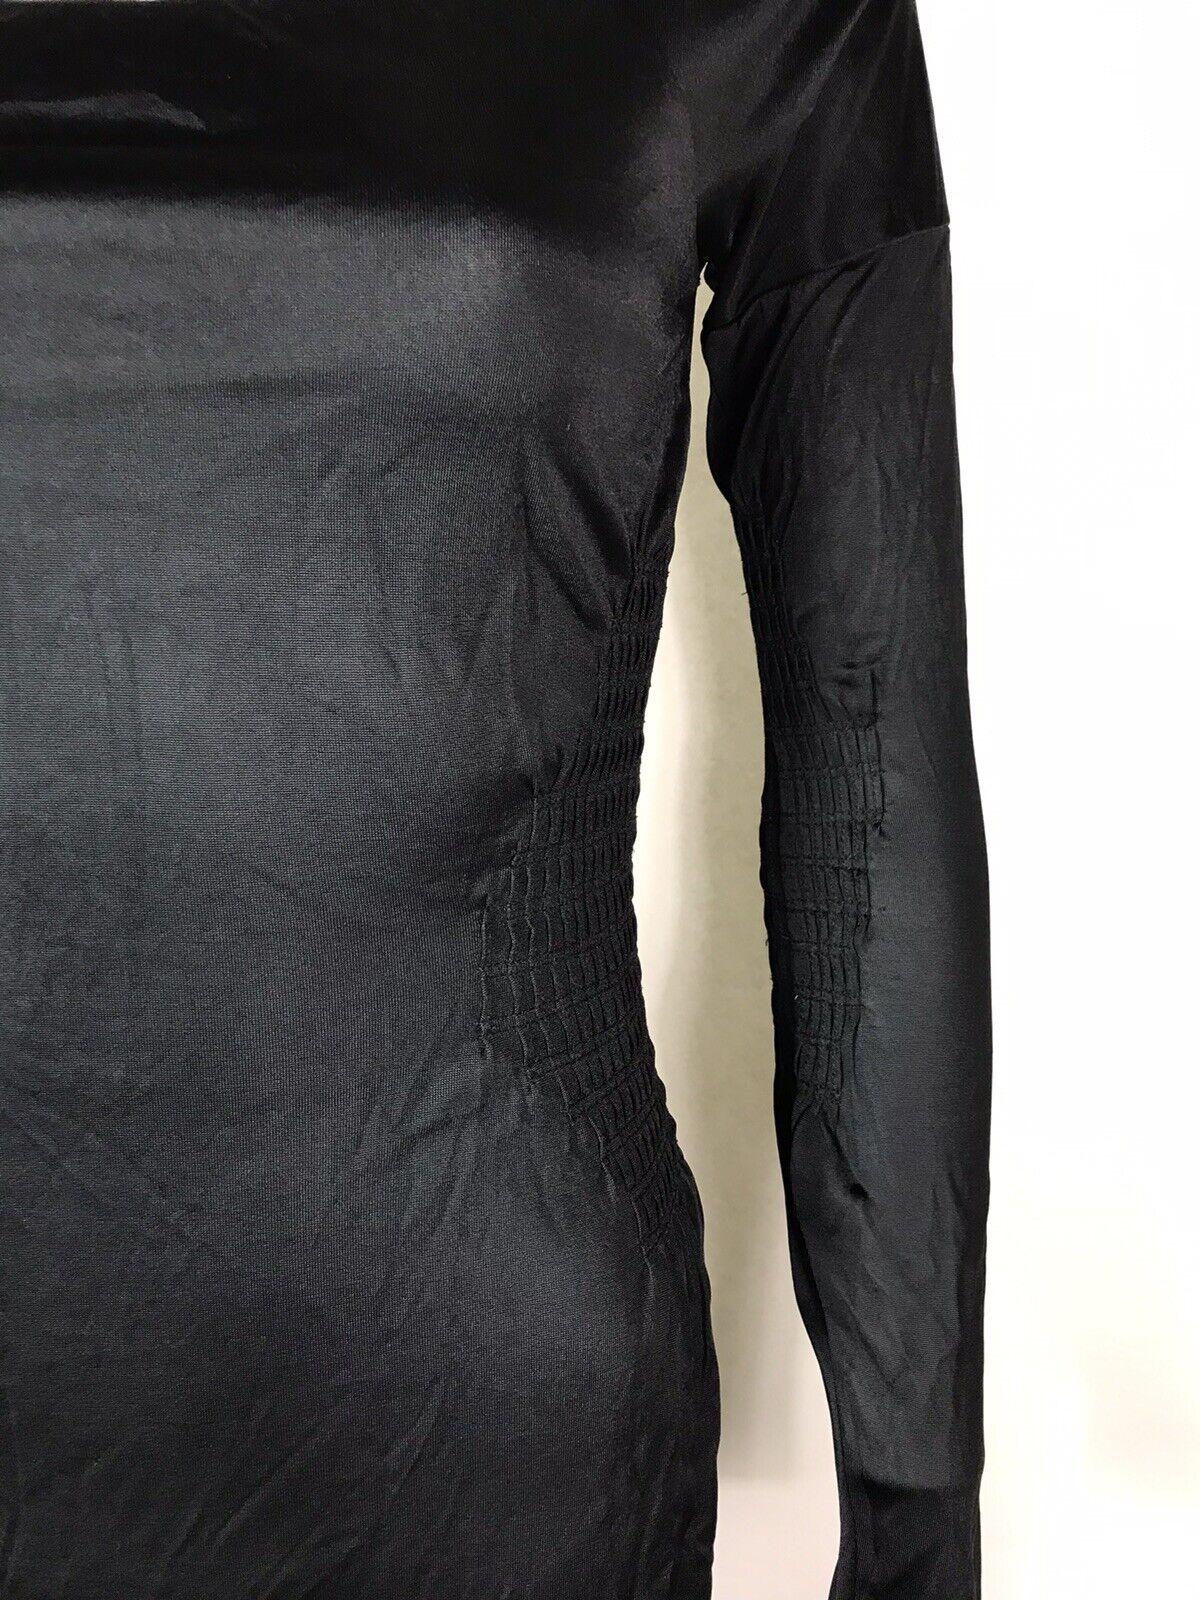 Rare Vtg Gucci Black Cut Out Dress S - image 7